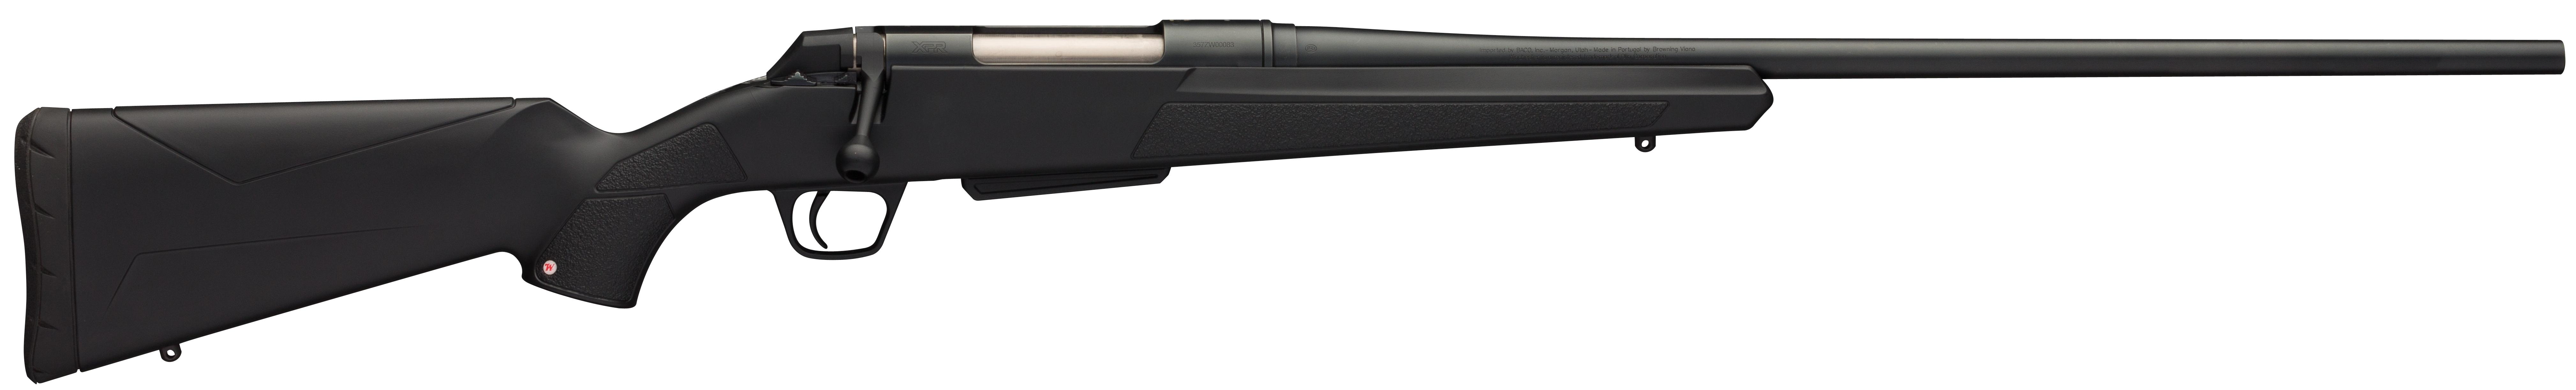 Winchester XPR 6.5 Creedmoor